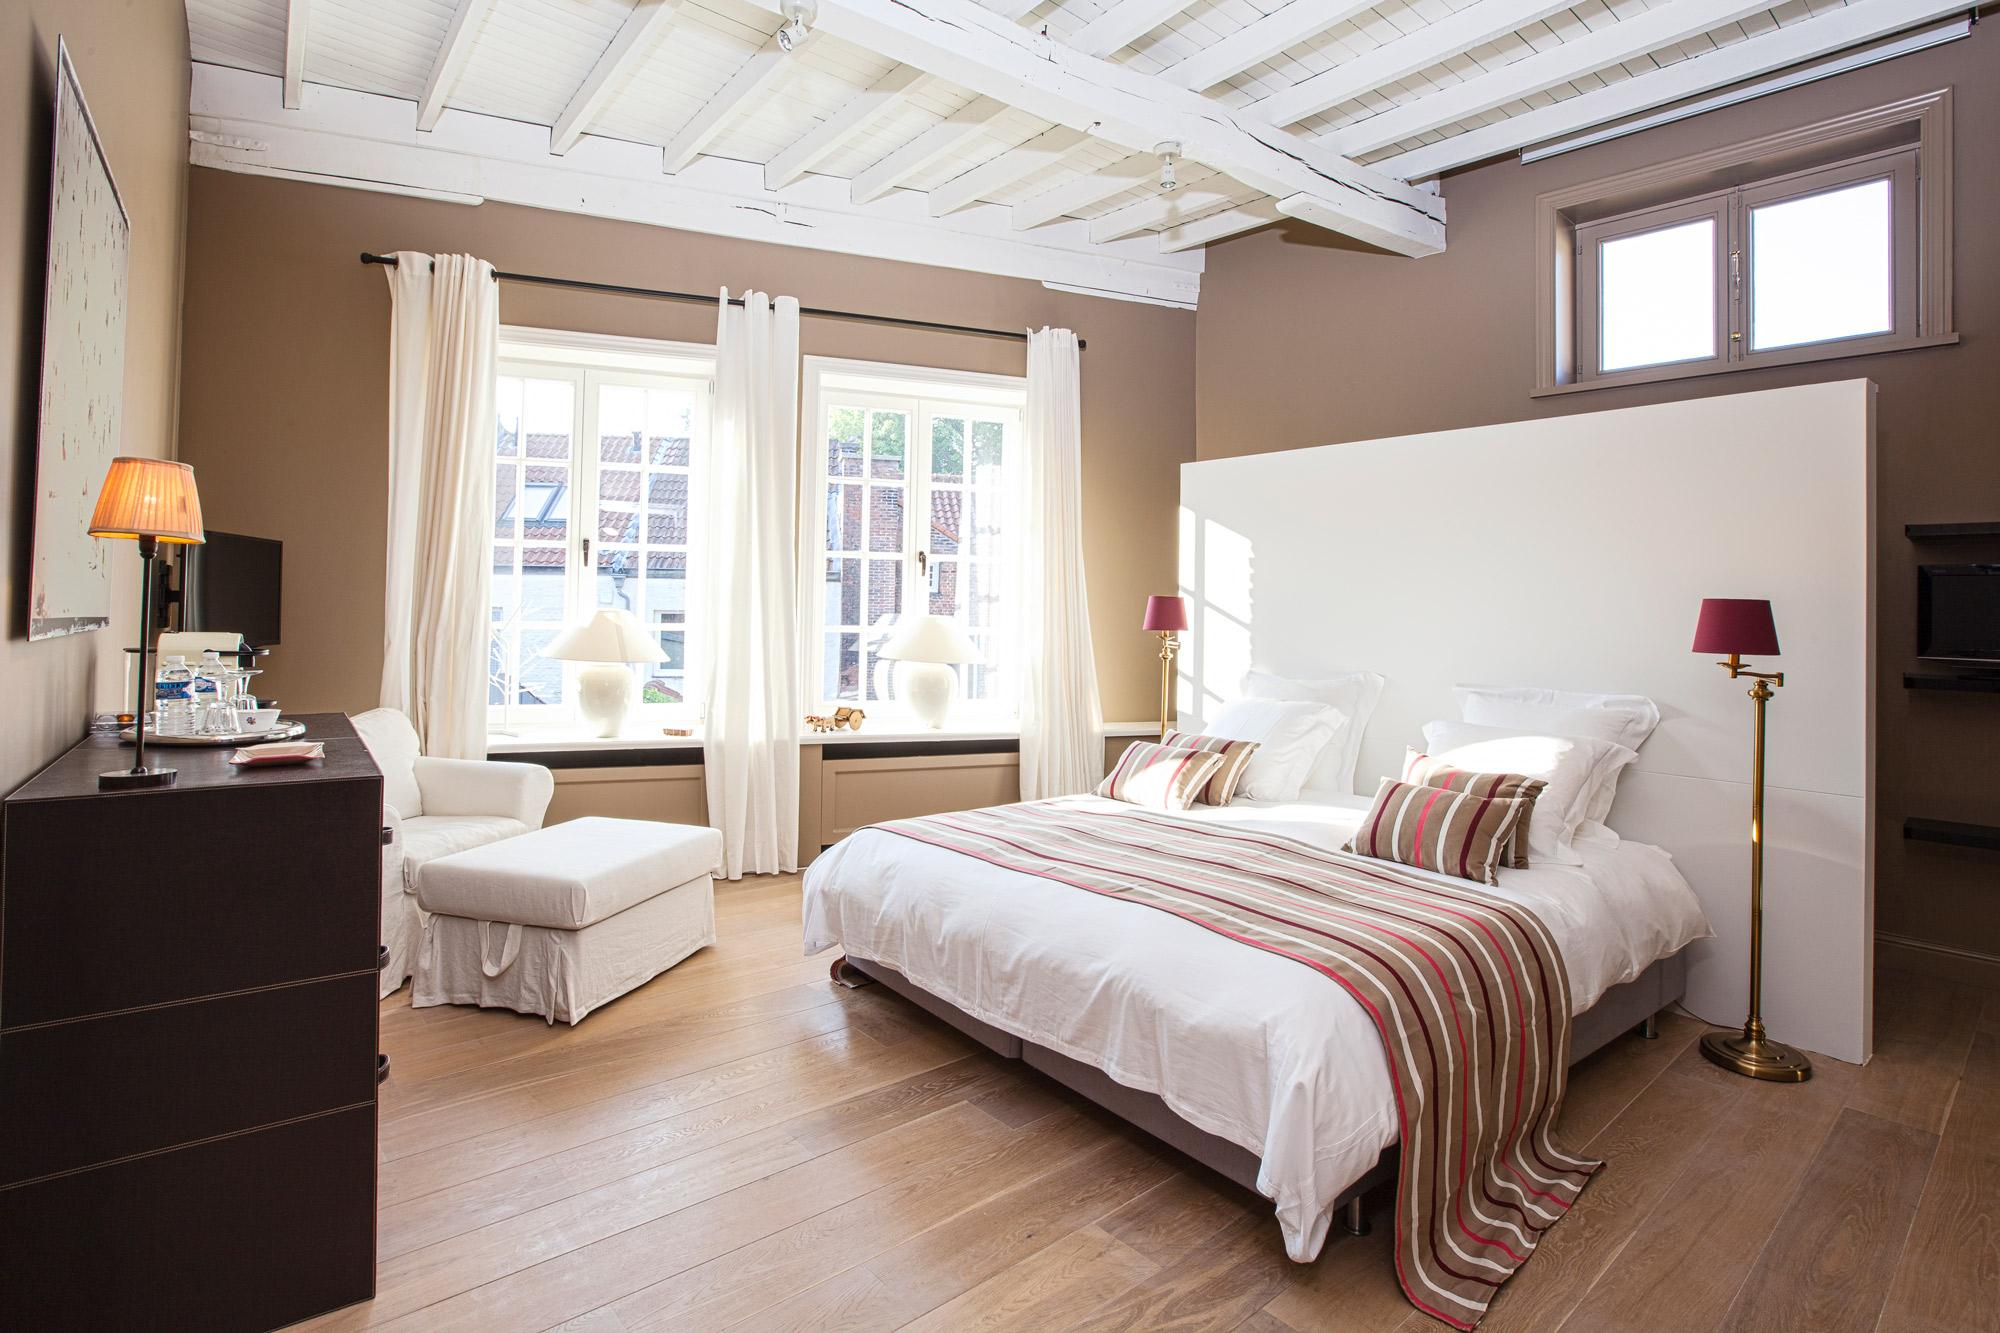 home maison amodio b b chambre d 39 h tes bruges. Black Bedroom Furniture Sets. Home Design Ideas